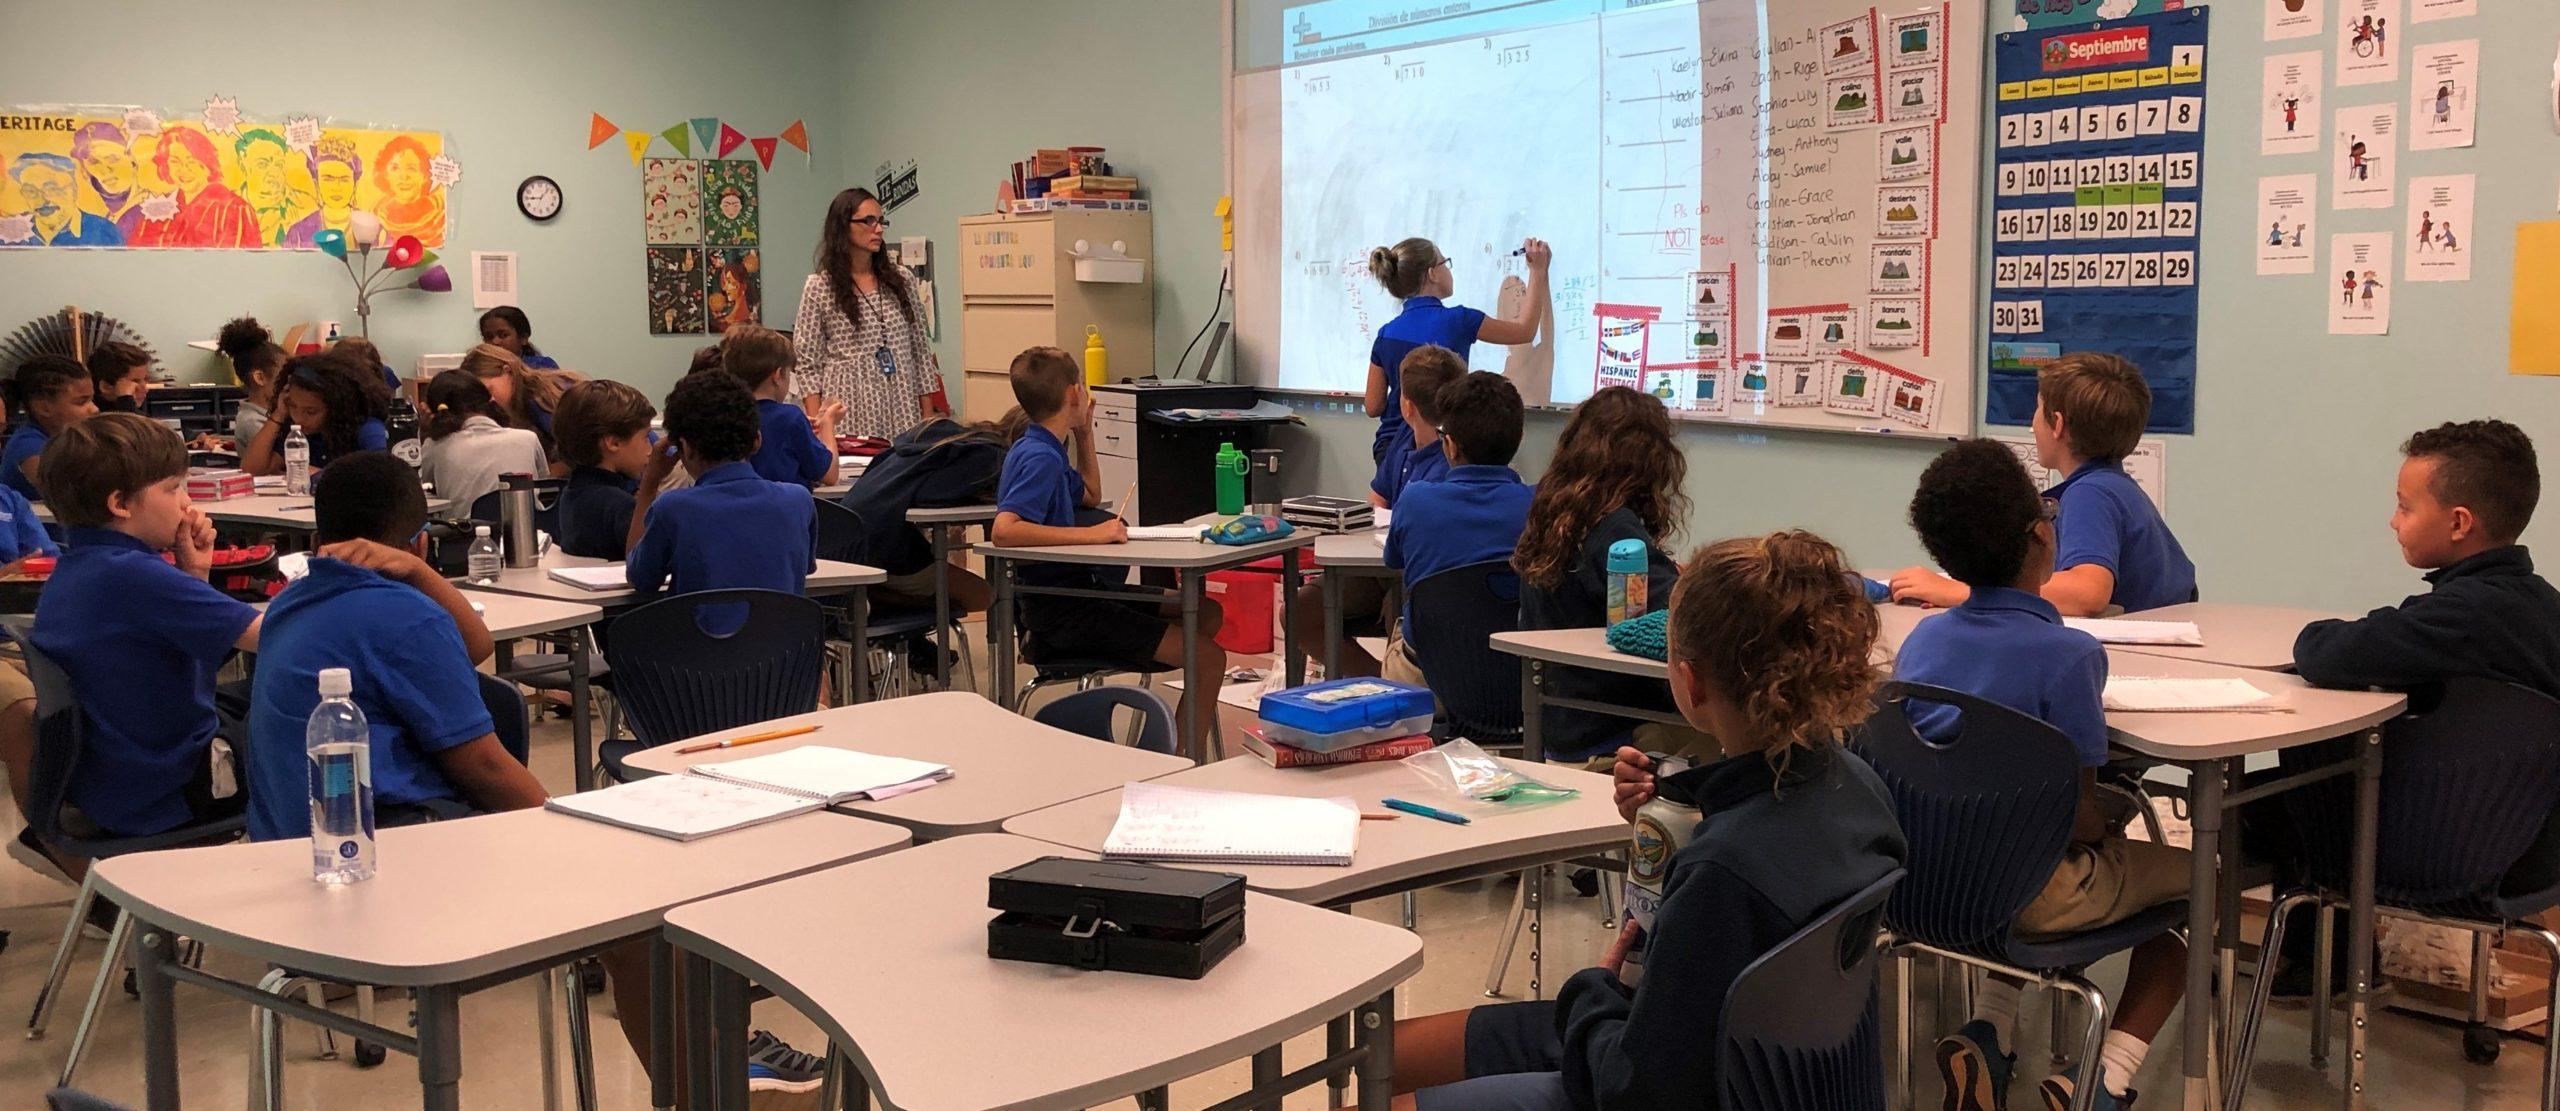 ICSAtlanta Spanish classroom 4th grade cropped